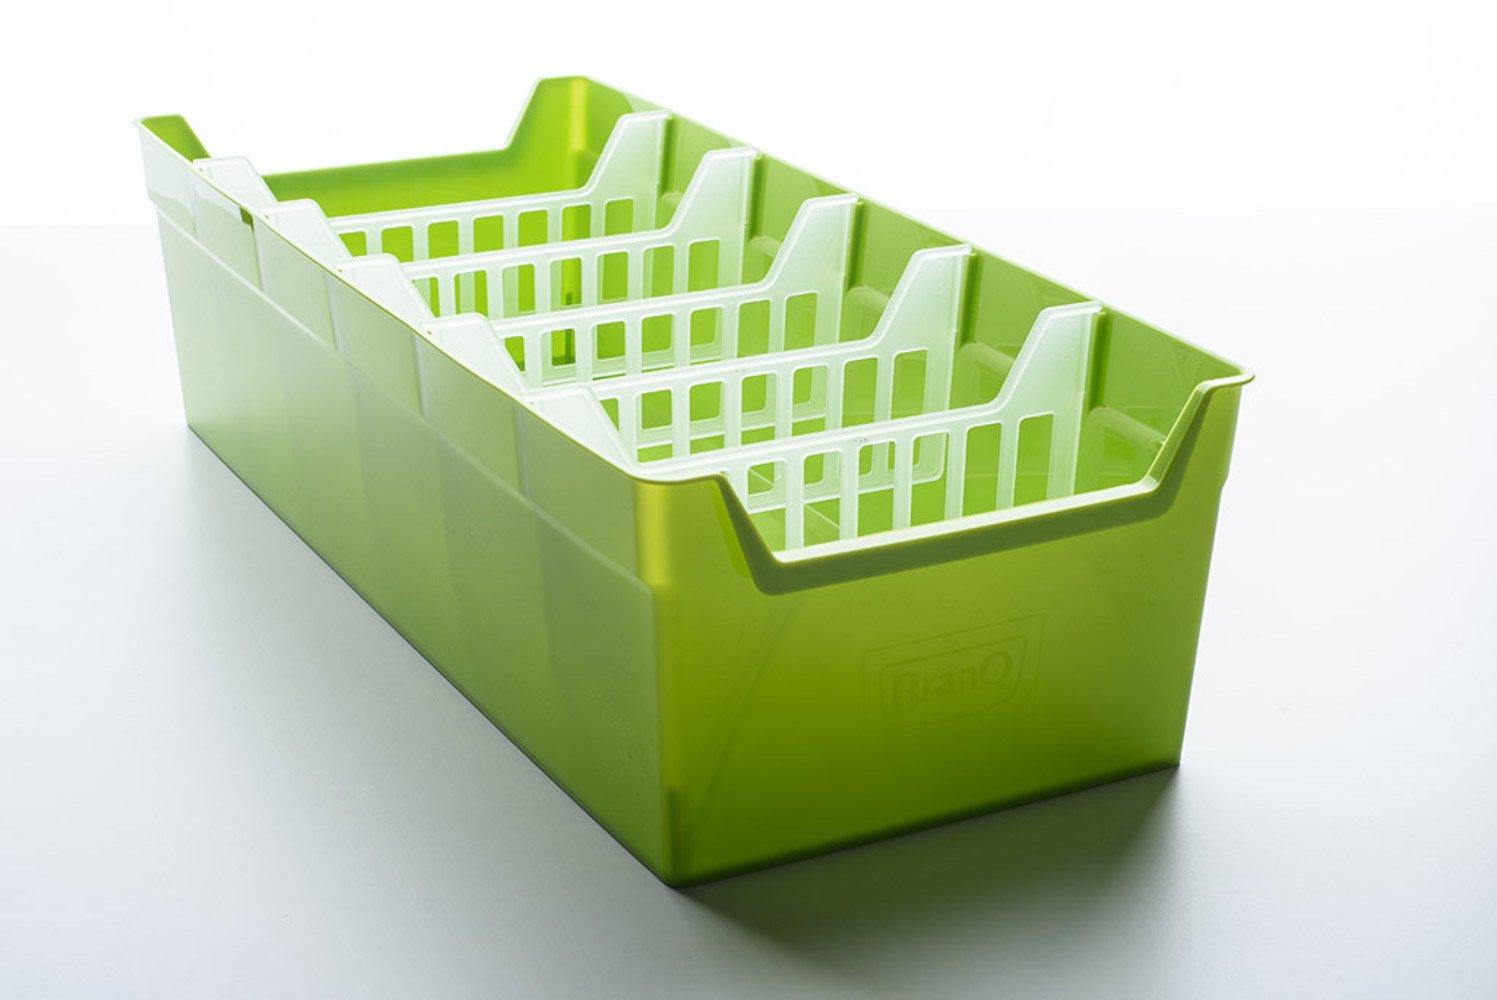 BranQ kitchen organiser, plastic, green, 35x 34.39x 14cm. 5901098164009